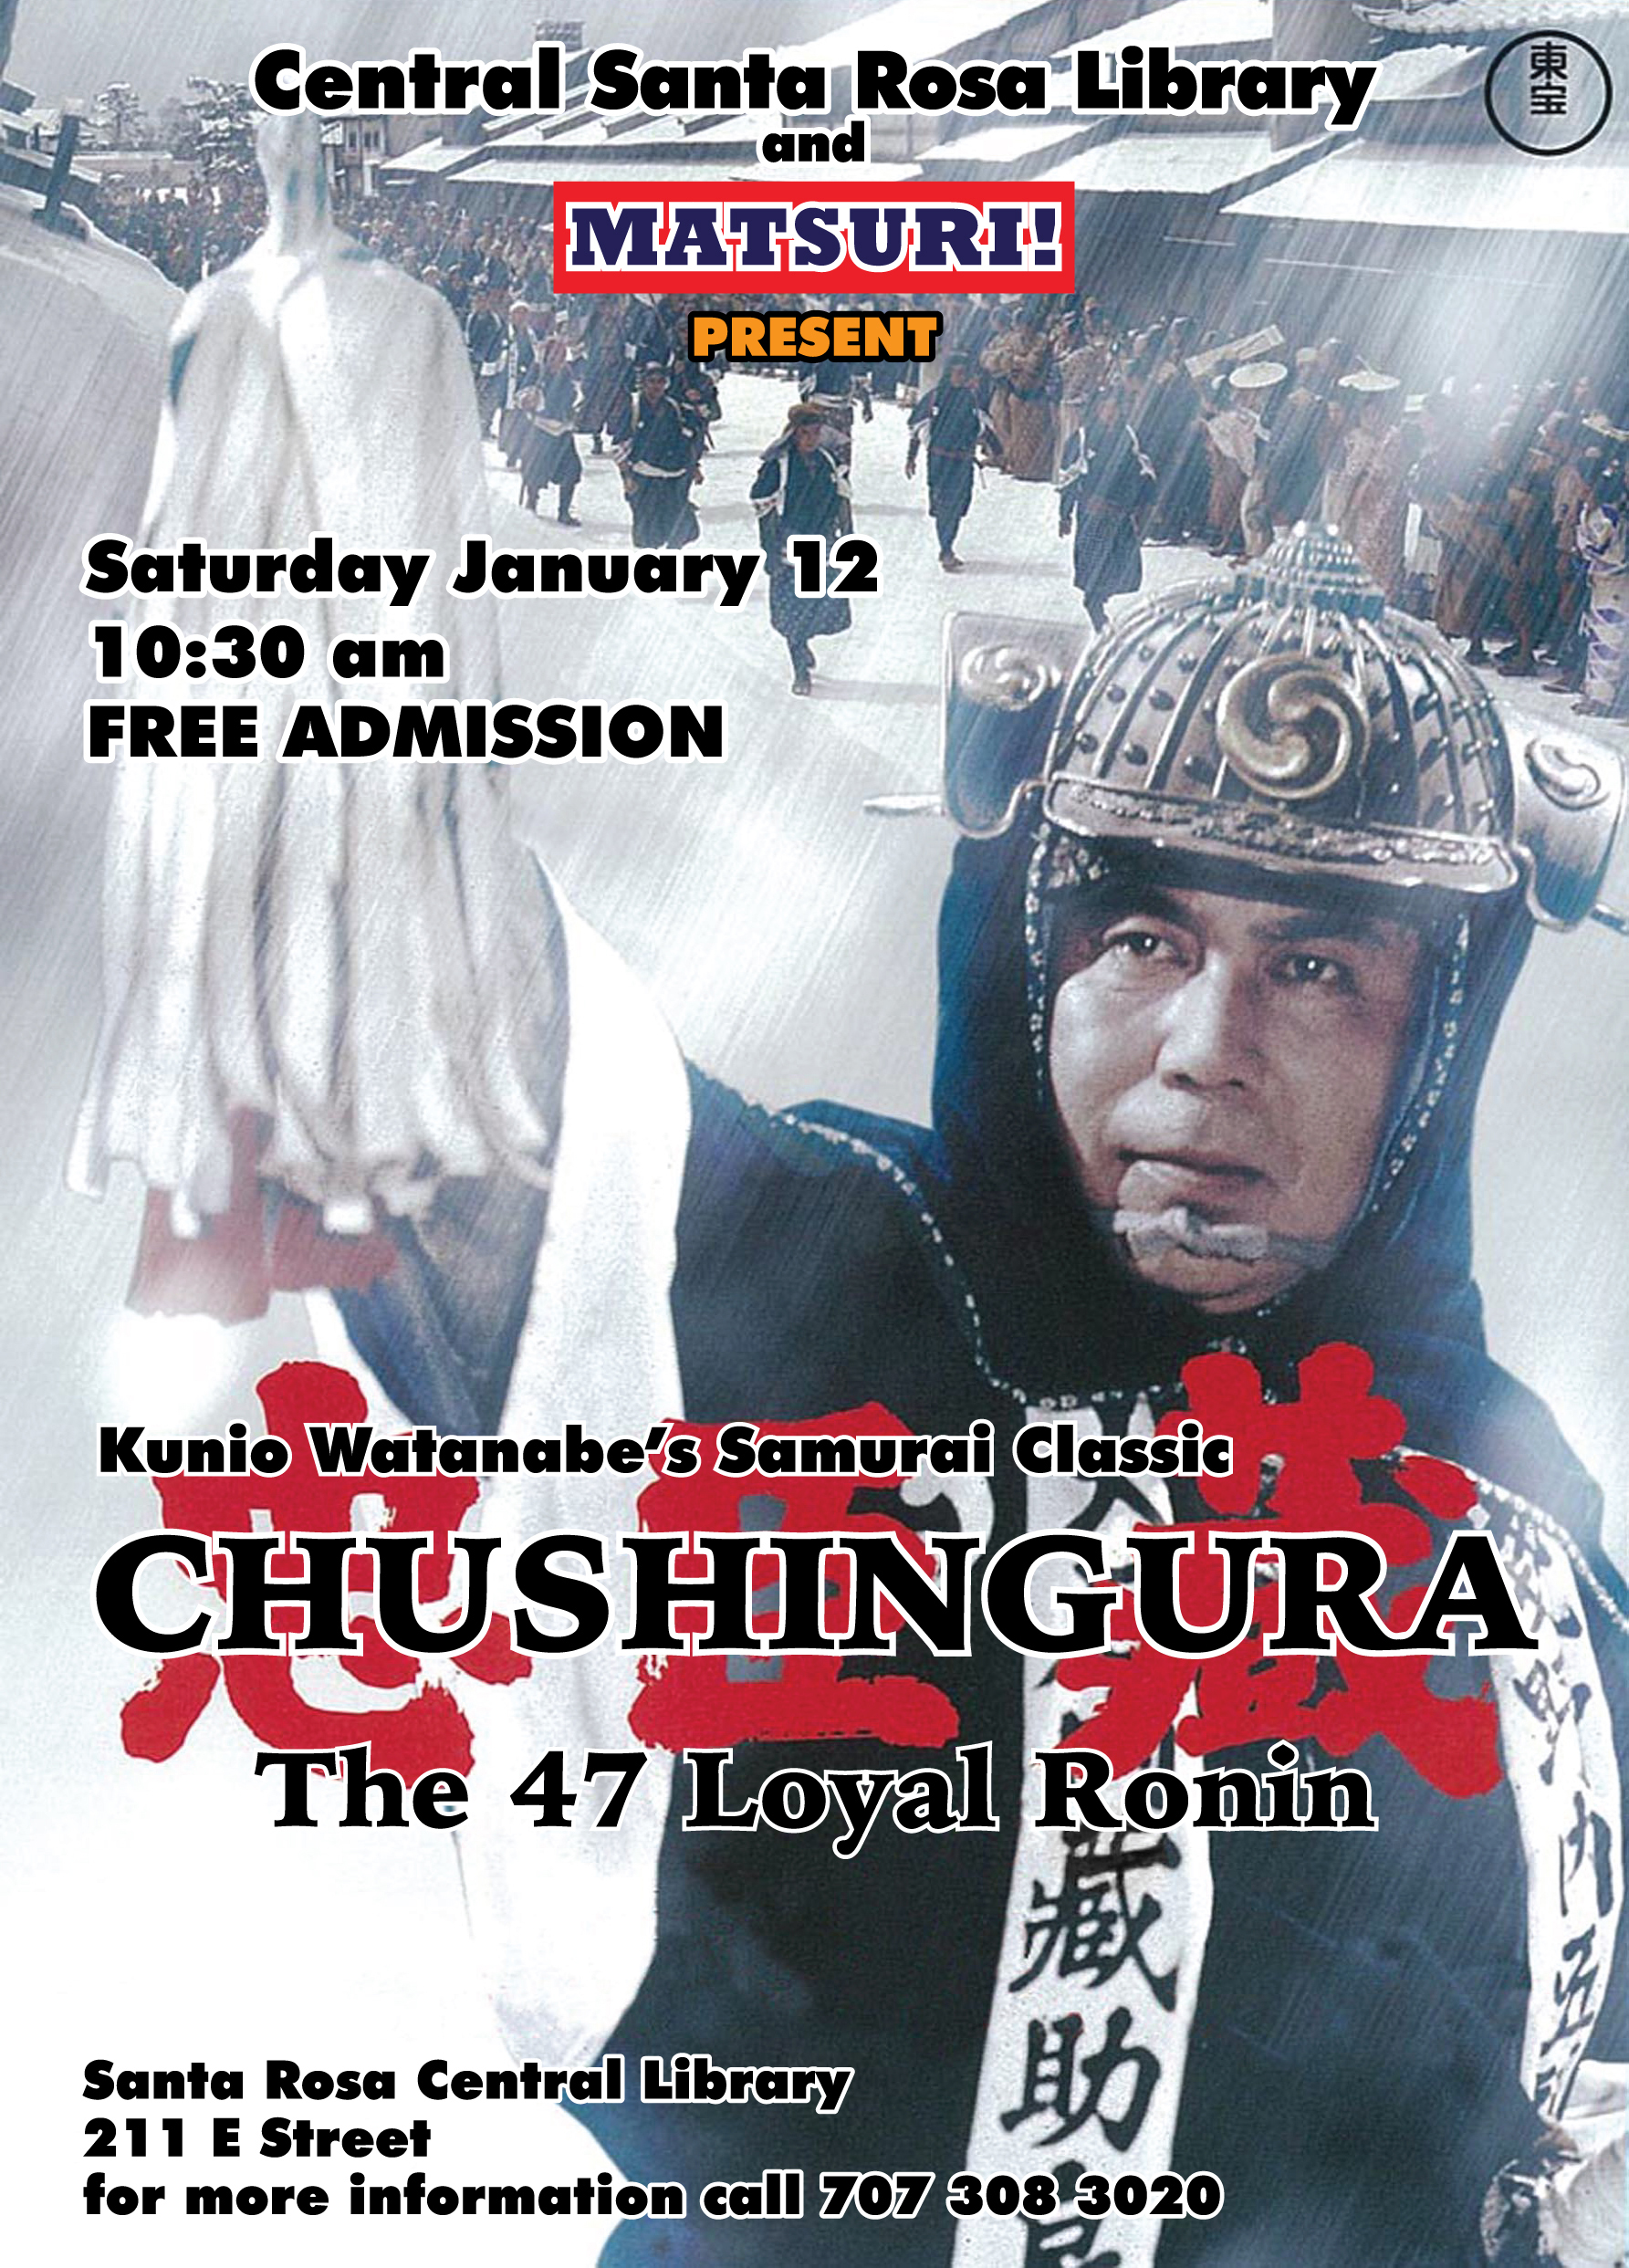 Matsuri Film Festival - Chushingura - 47 Ronin